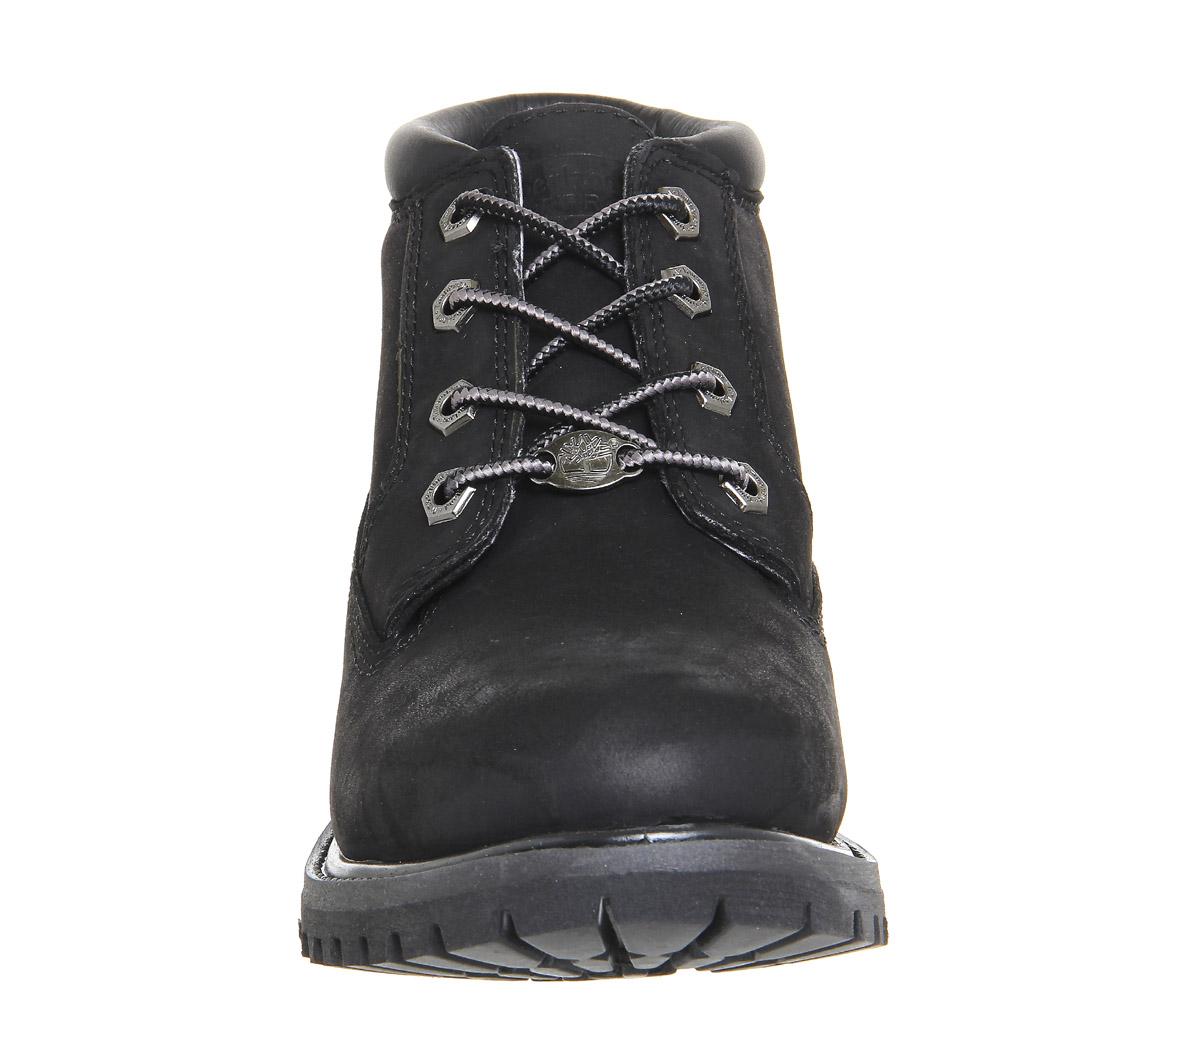 SENTINEL Donna Timberland Nellie Chukka Doppia Impermeabile Stivali stivali  neri MONO 13b77052c63